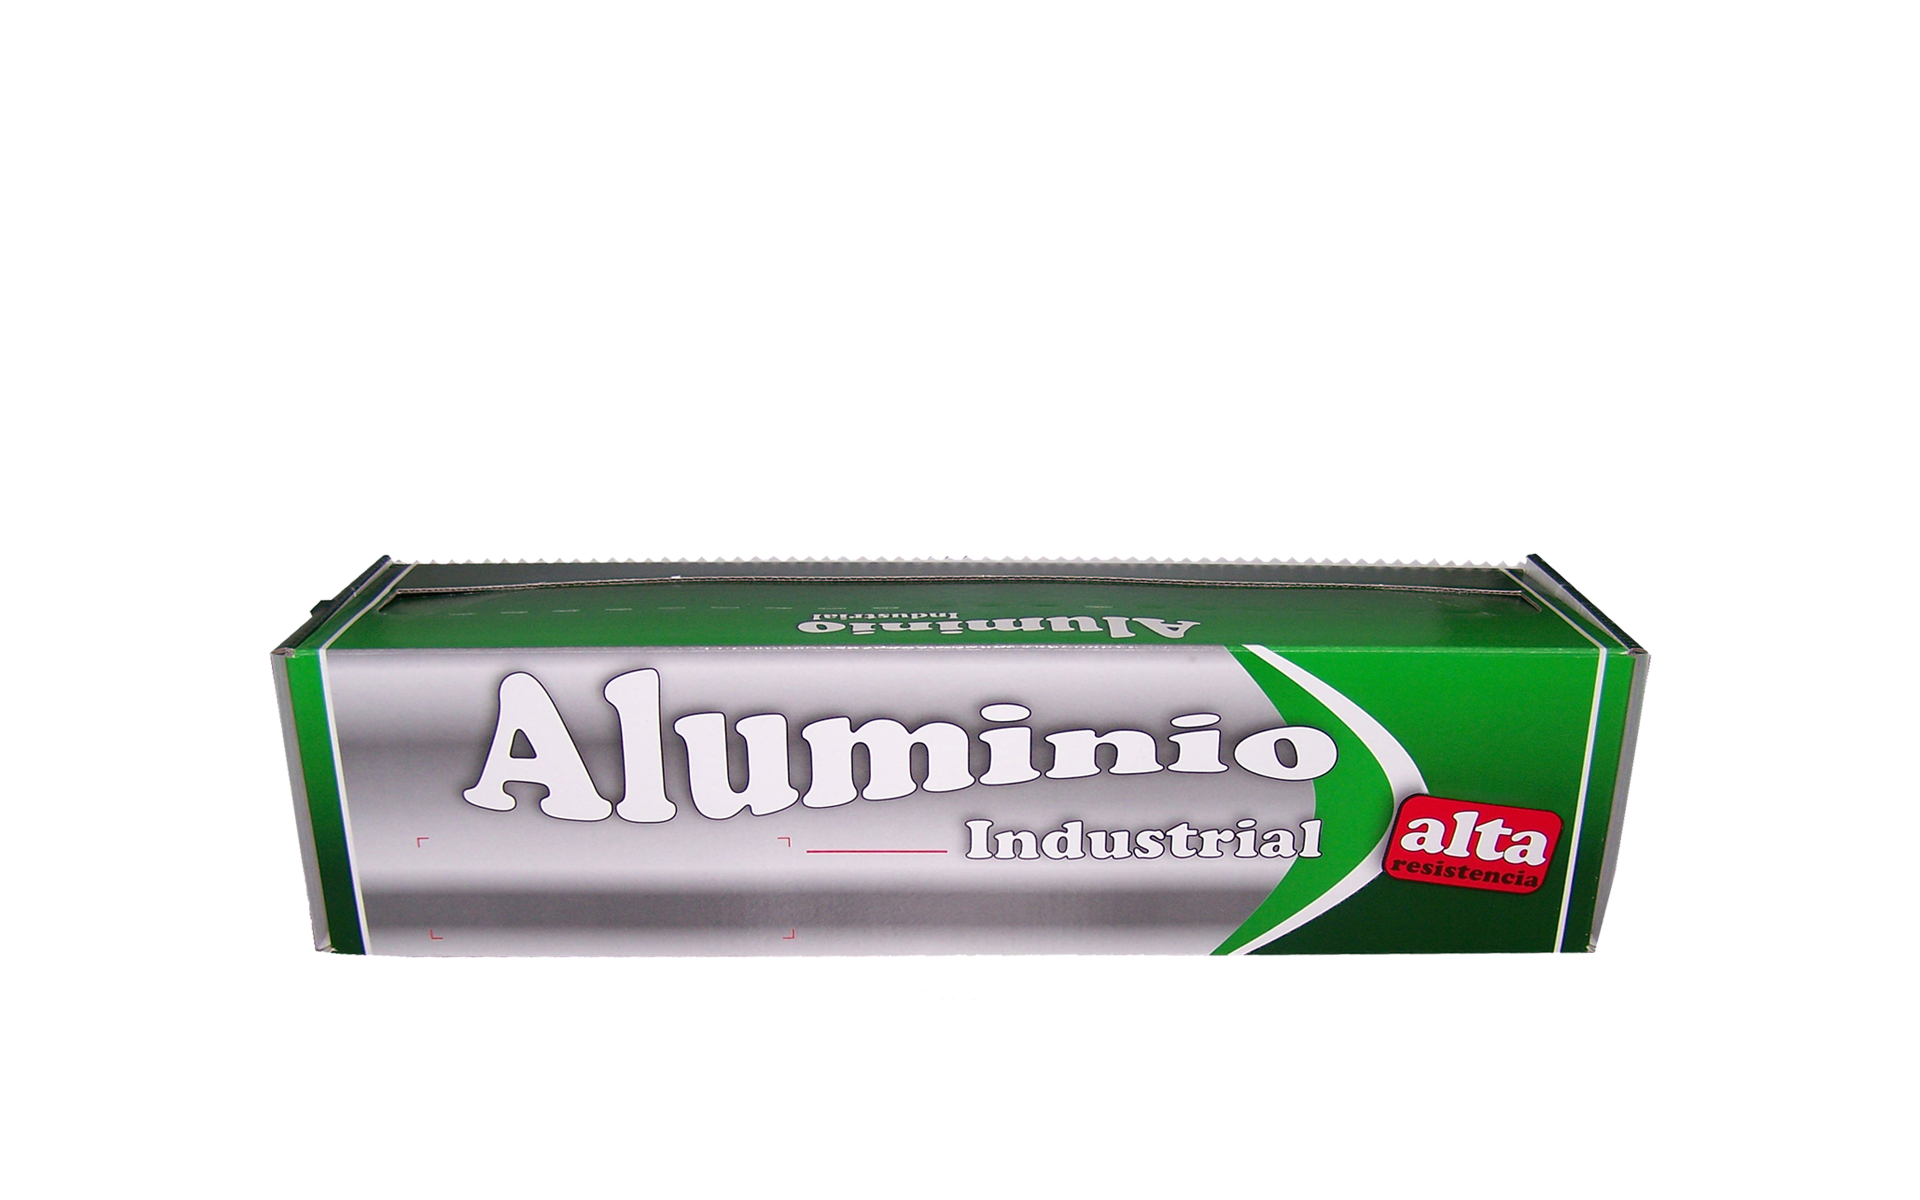 Rollo de Aluminio industrial 400mm.